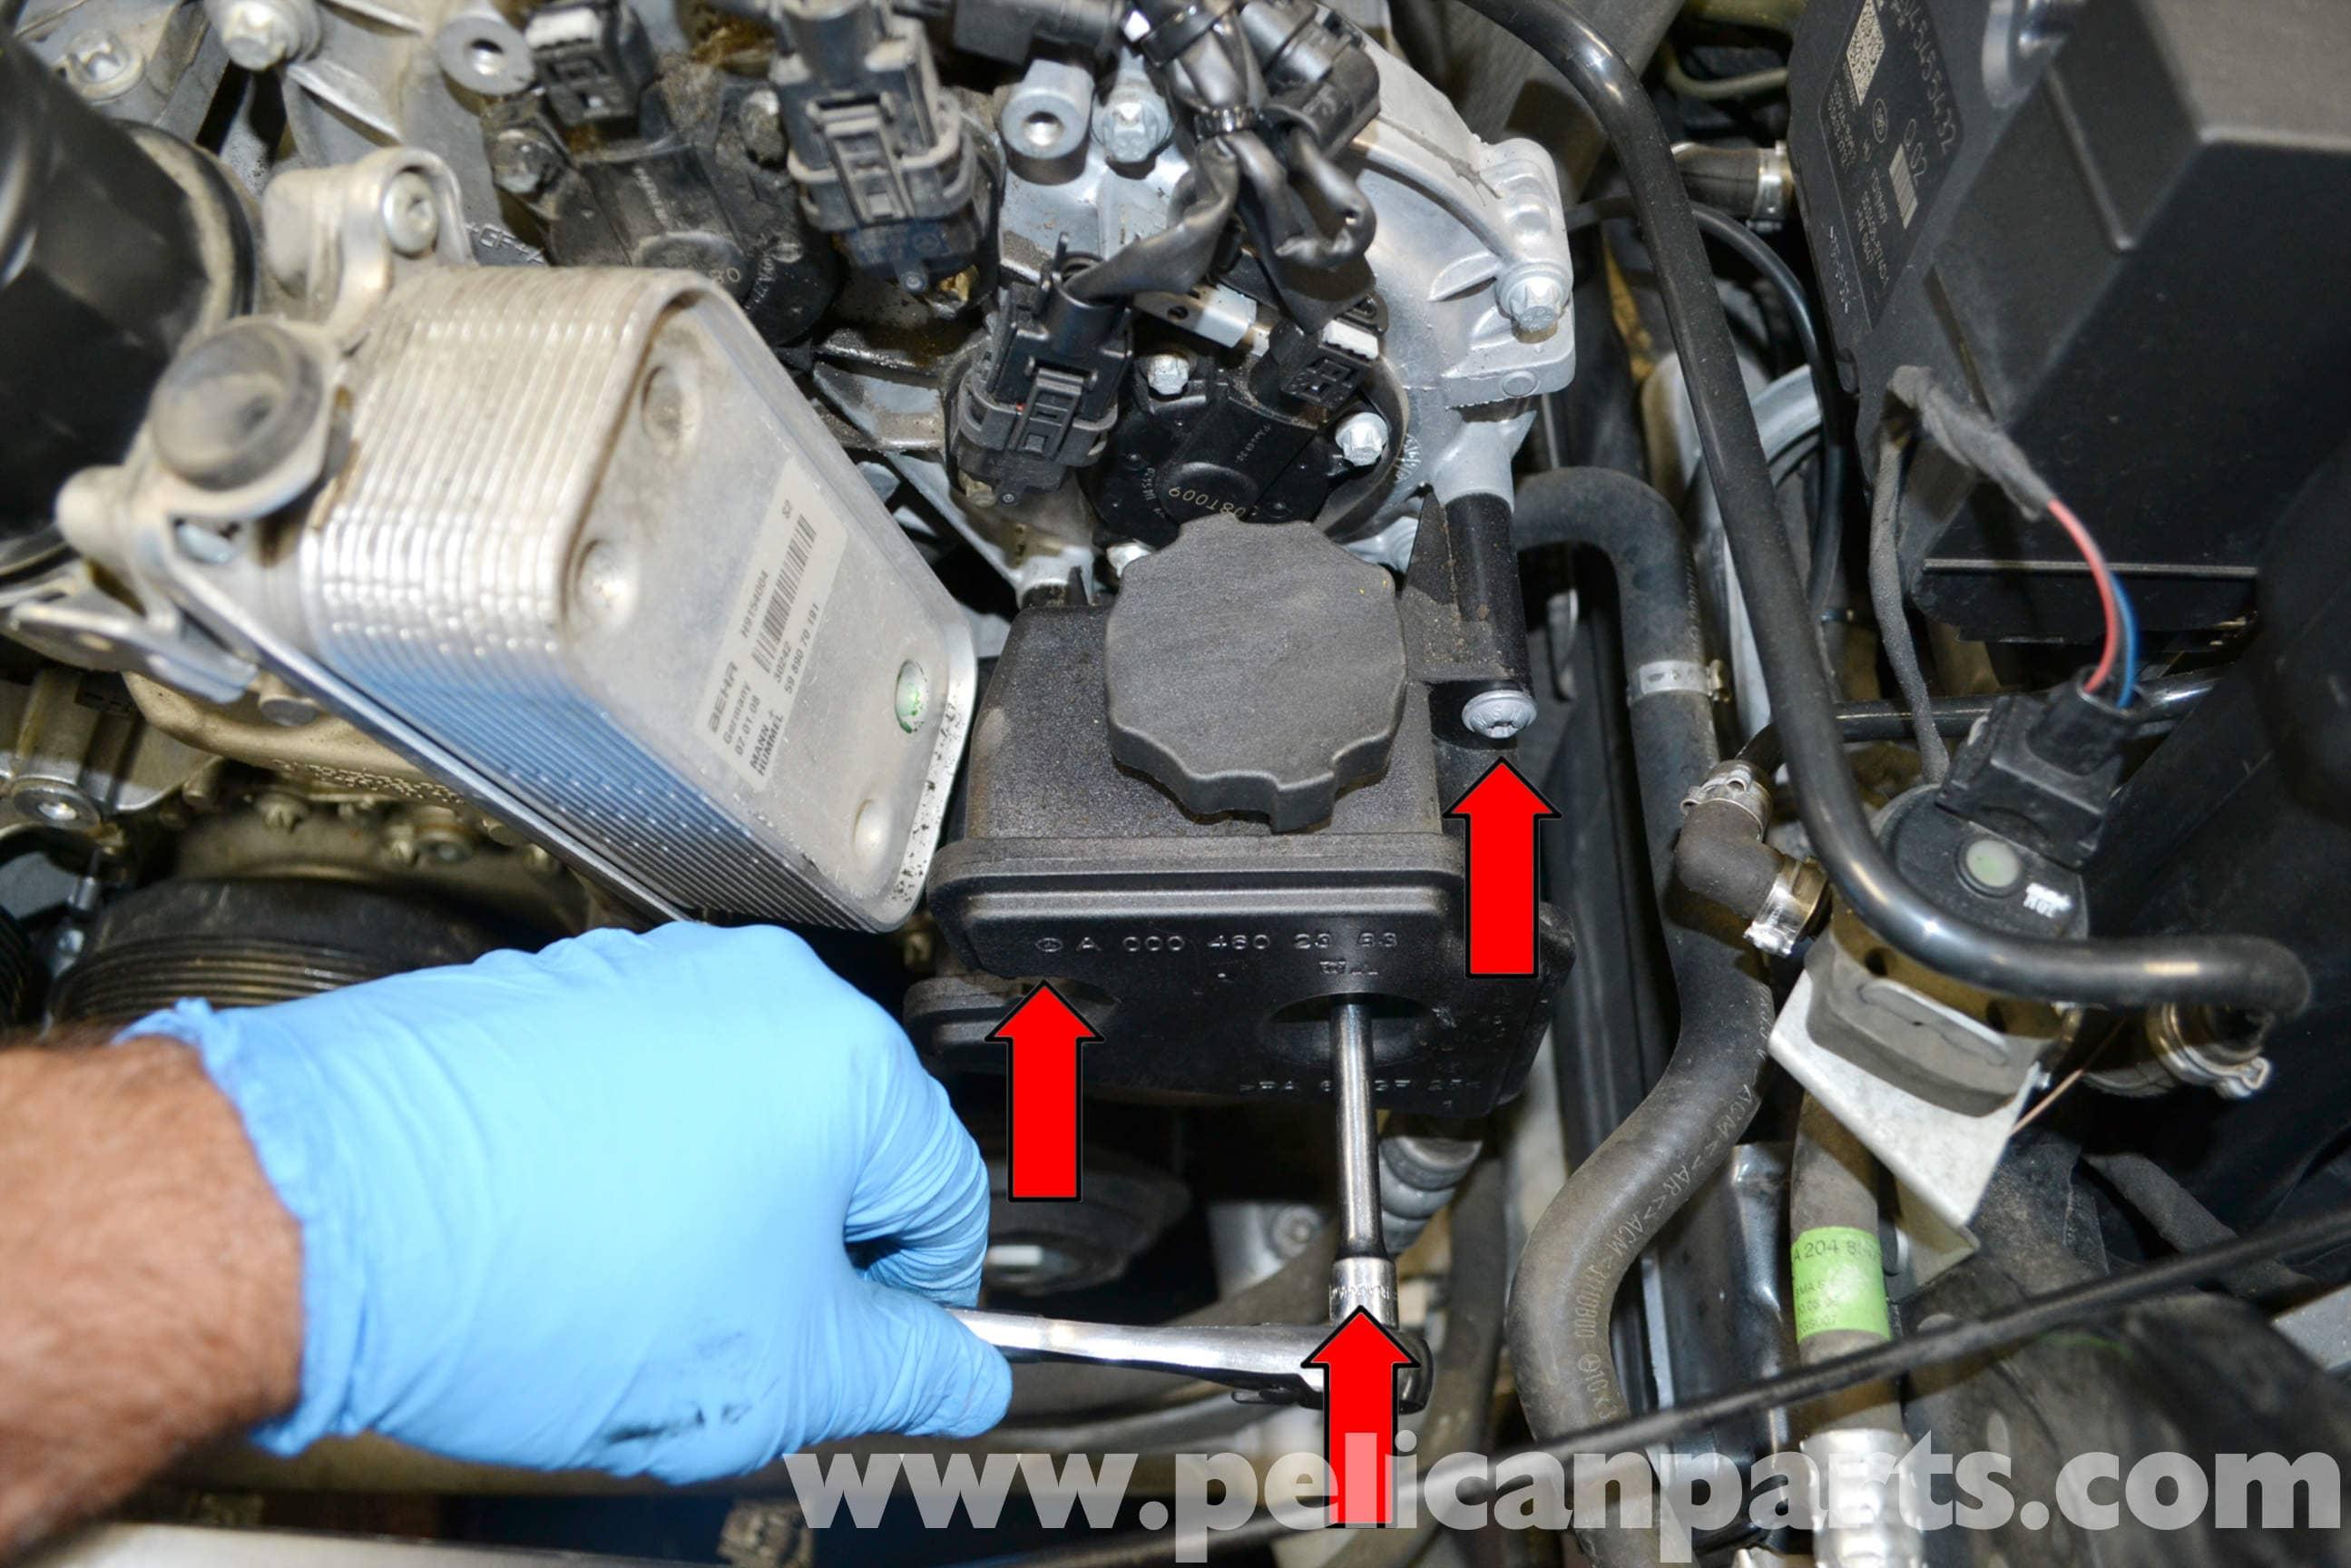 Mercedes Benz W204 Power Steering Pump Replacement 2008